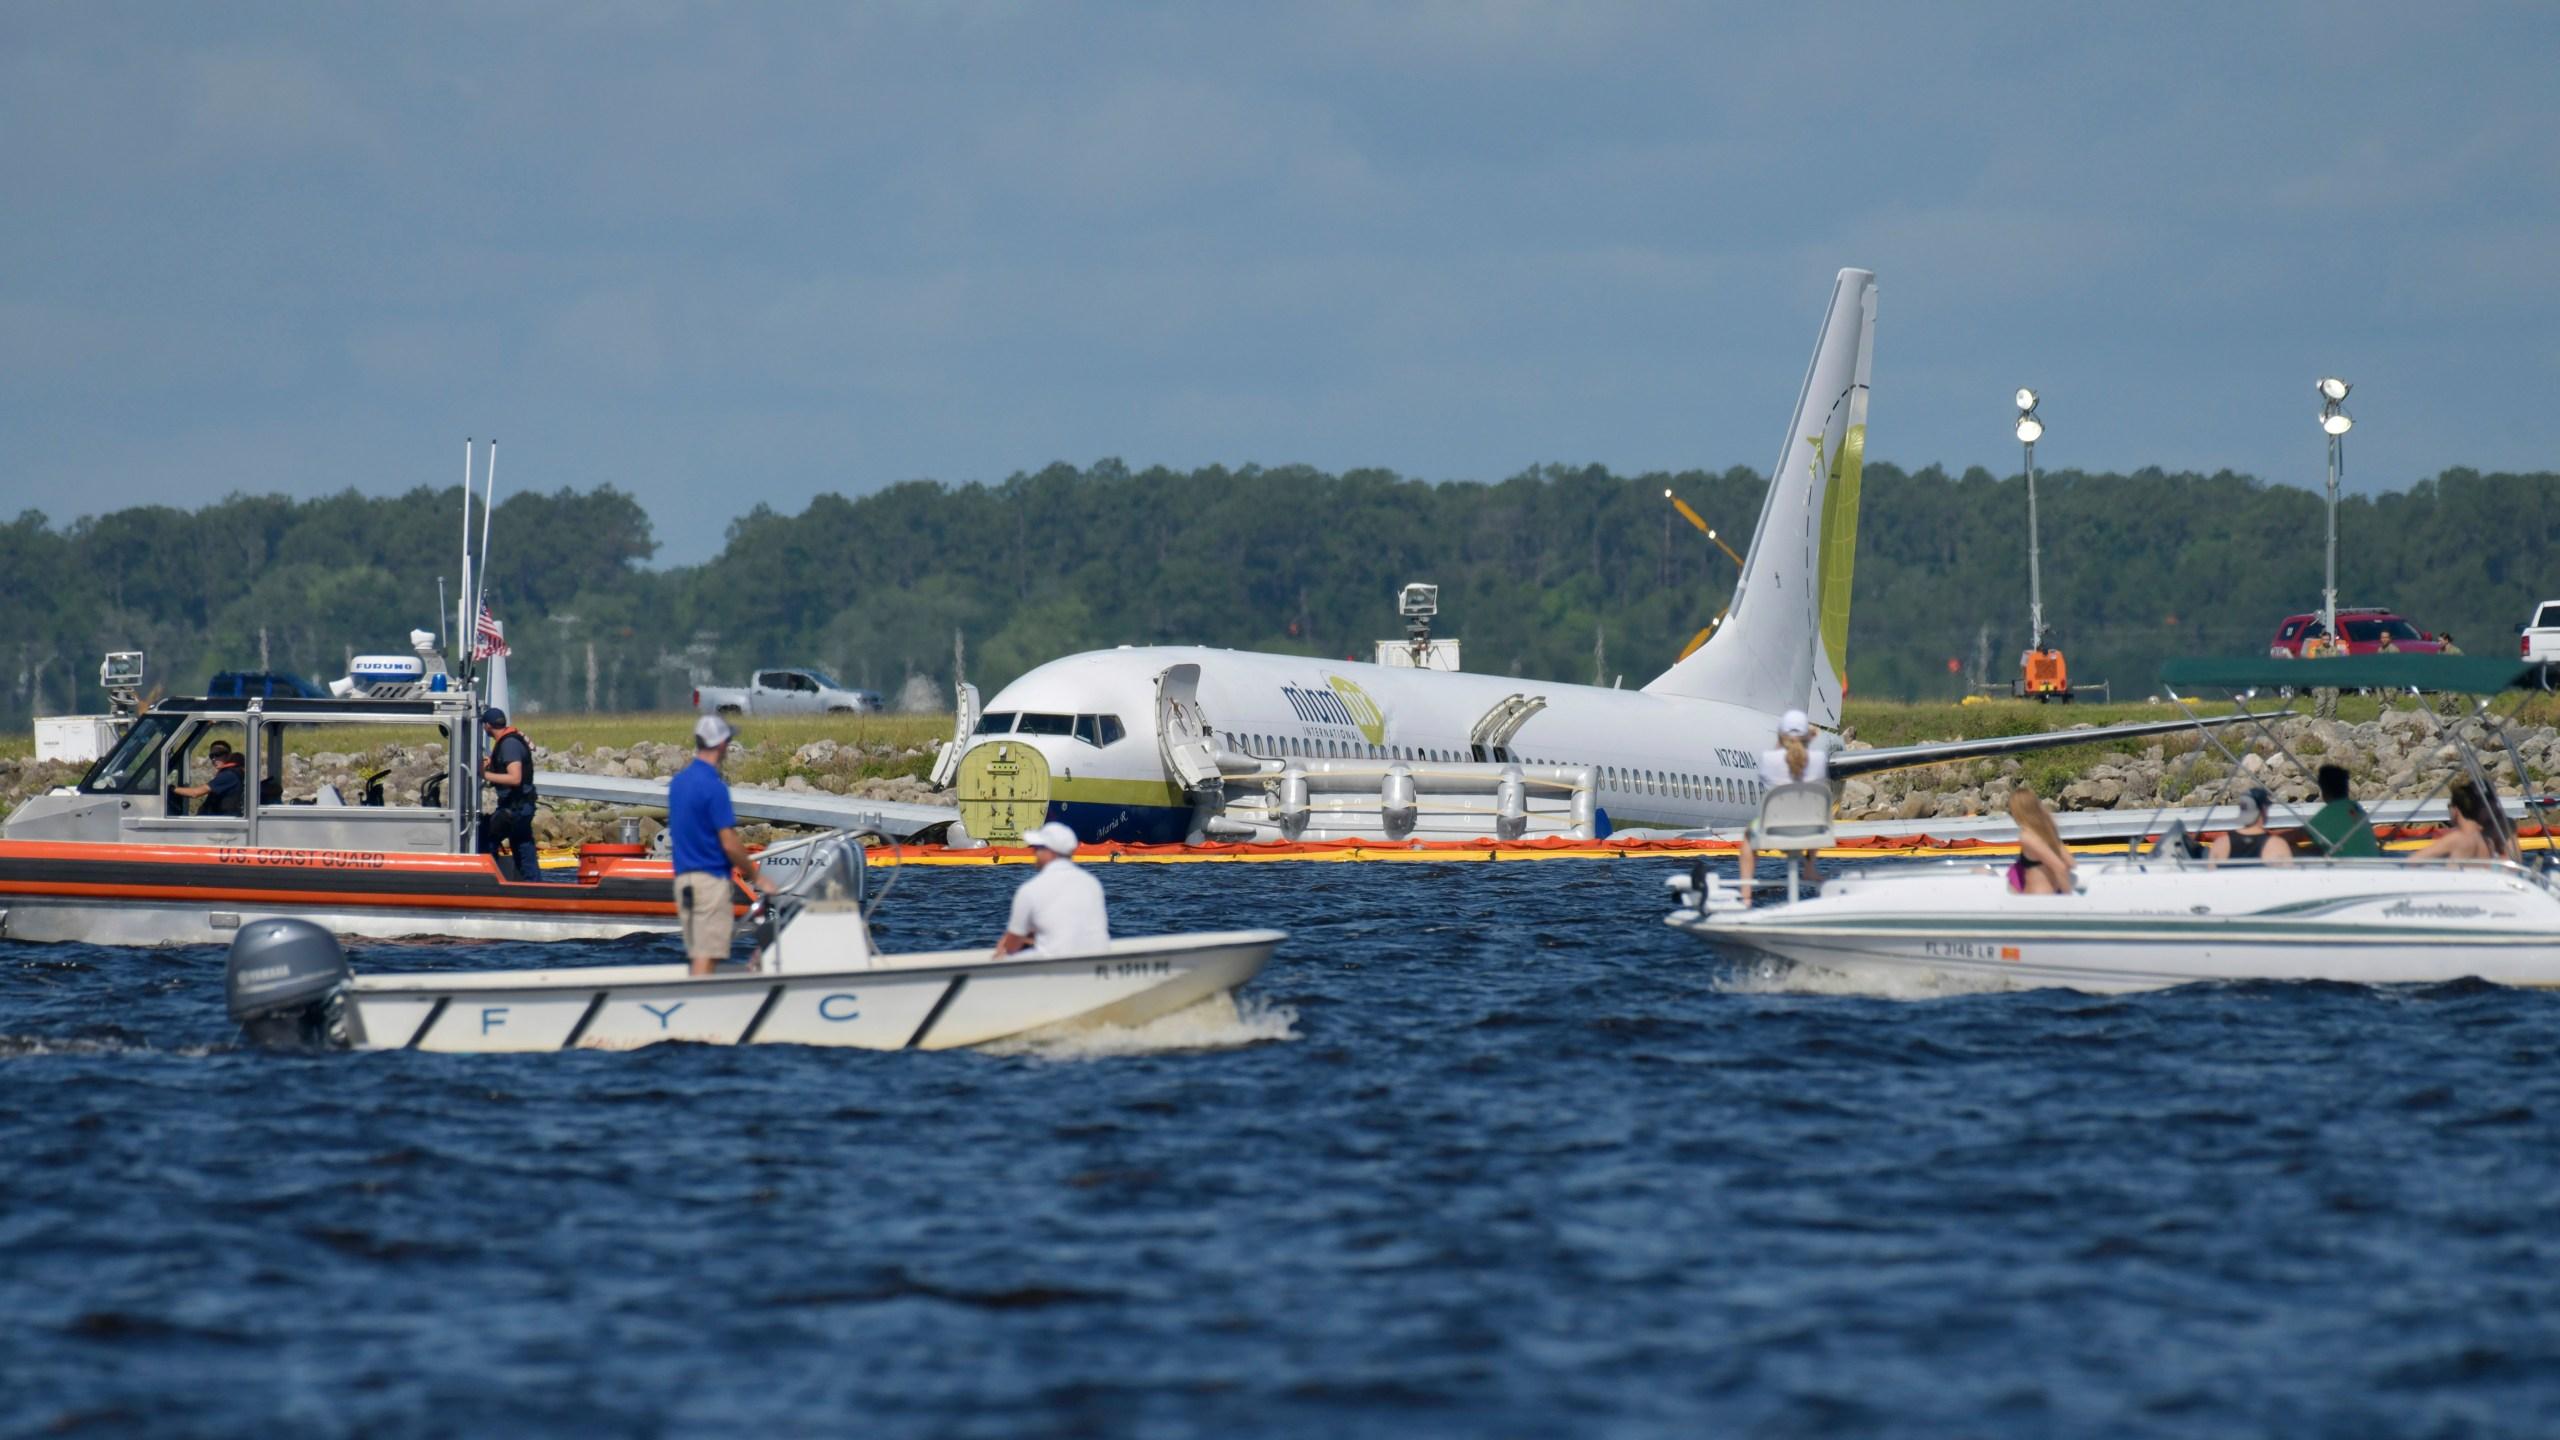 Plane_Crash_Florida_River_63641-159532.jpg06786103